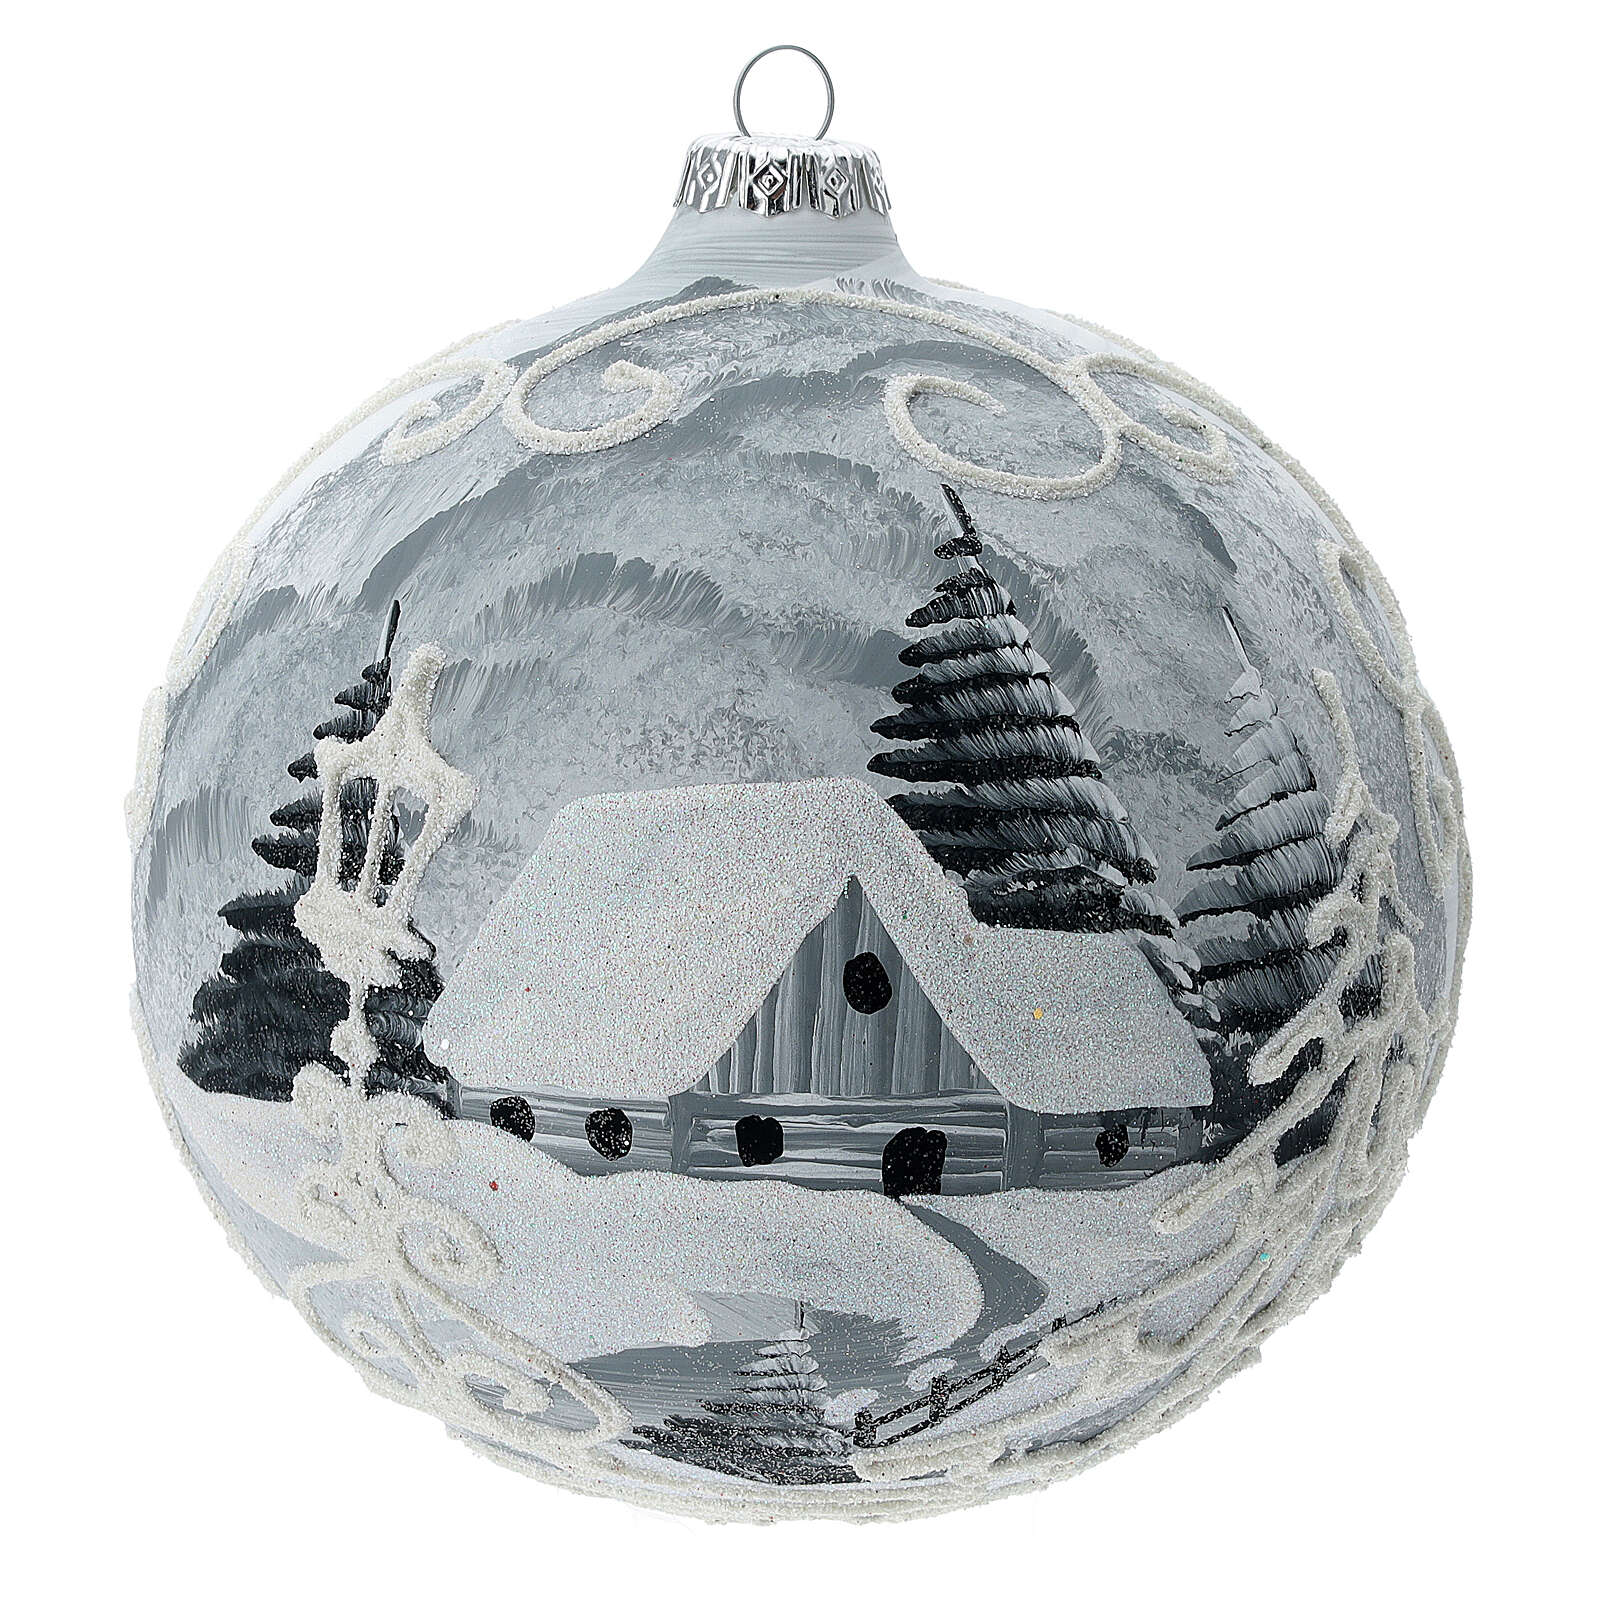 Glass Christmas tree ball ornament white frame silver village 150 mm 4